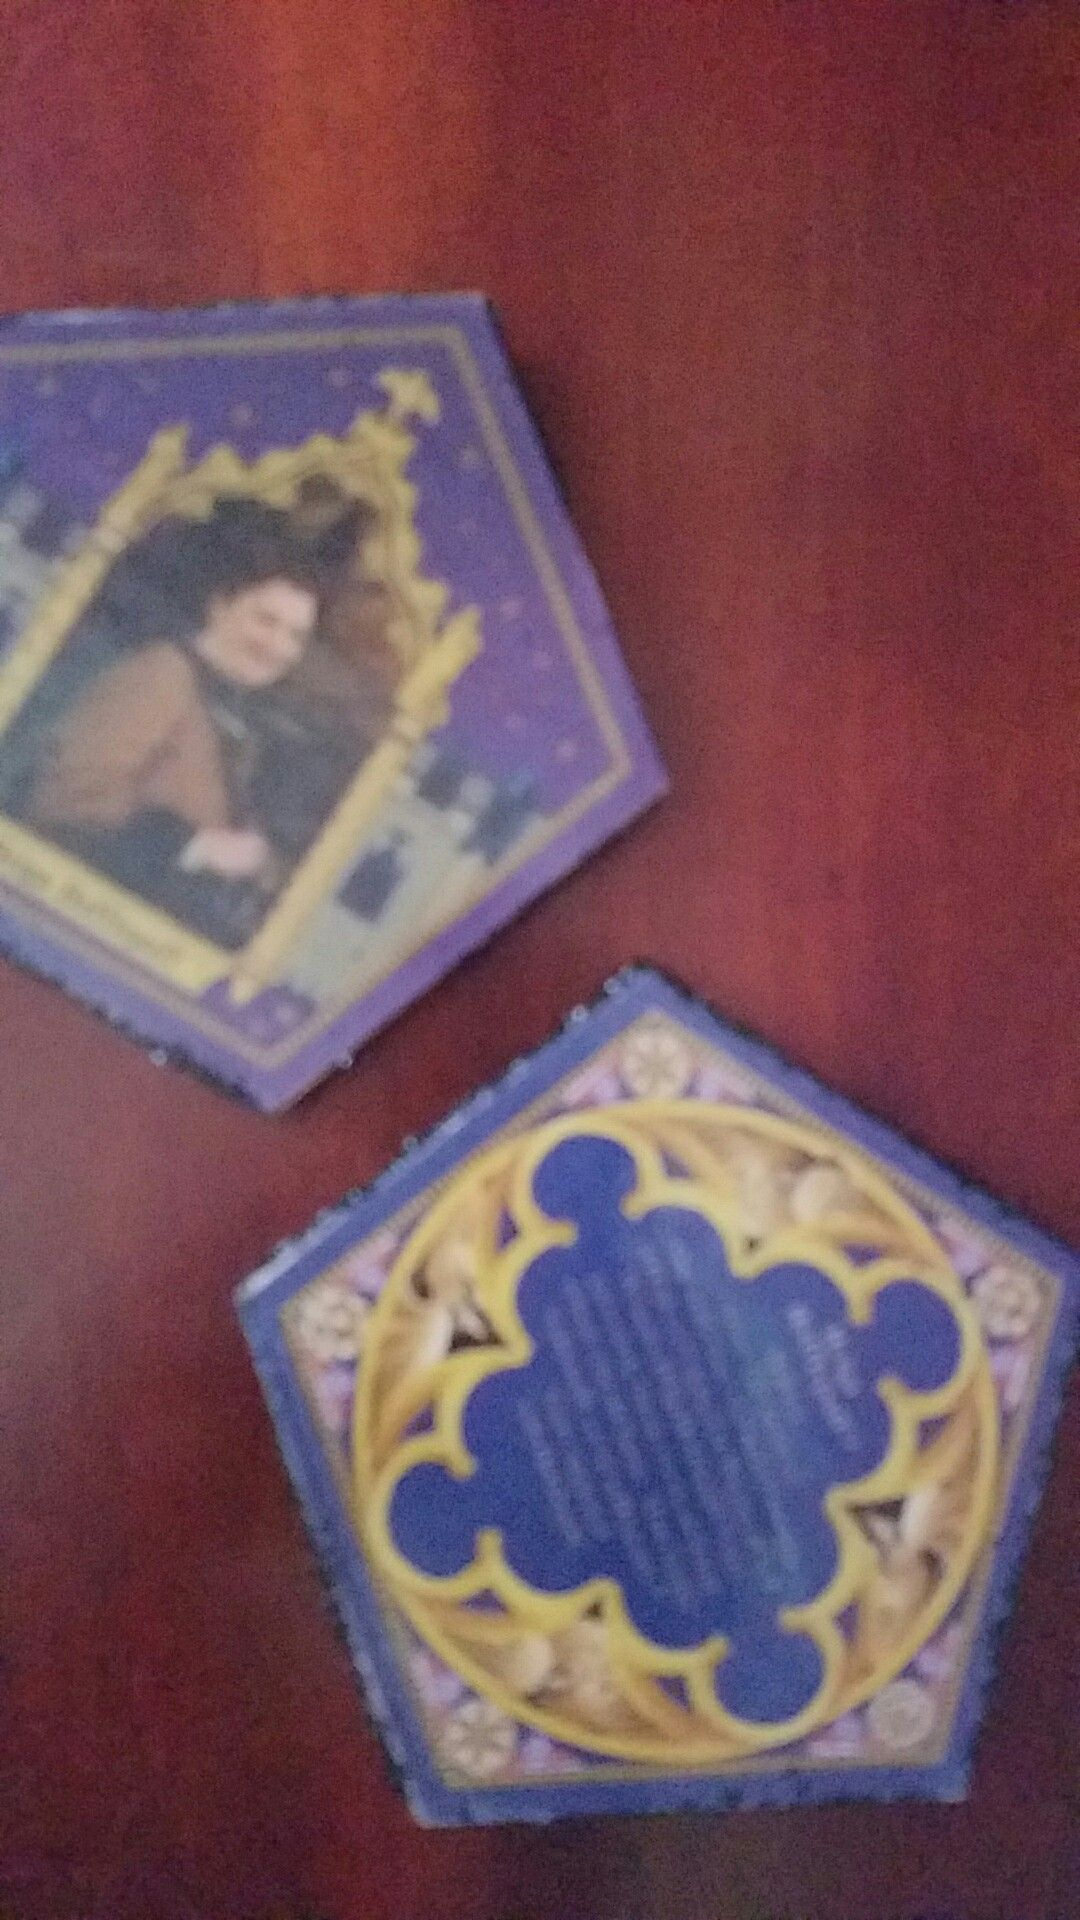 Pin by Elizabeth Vaughn on Audrey's Harry Potter room